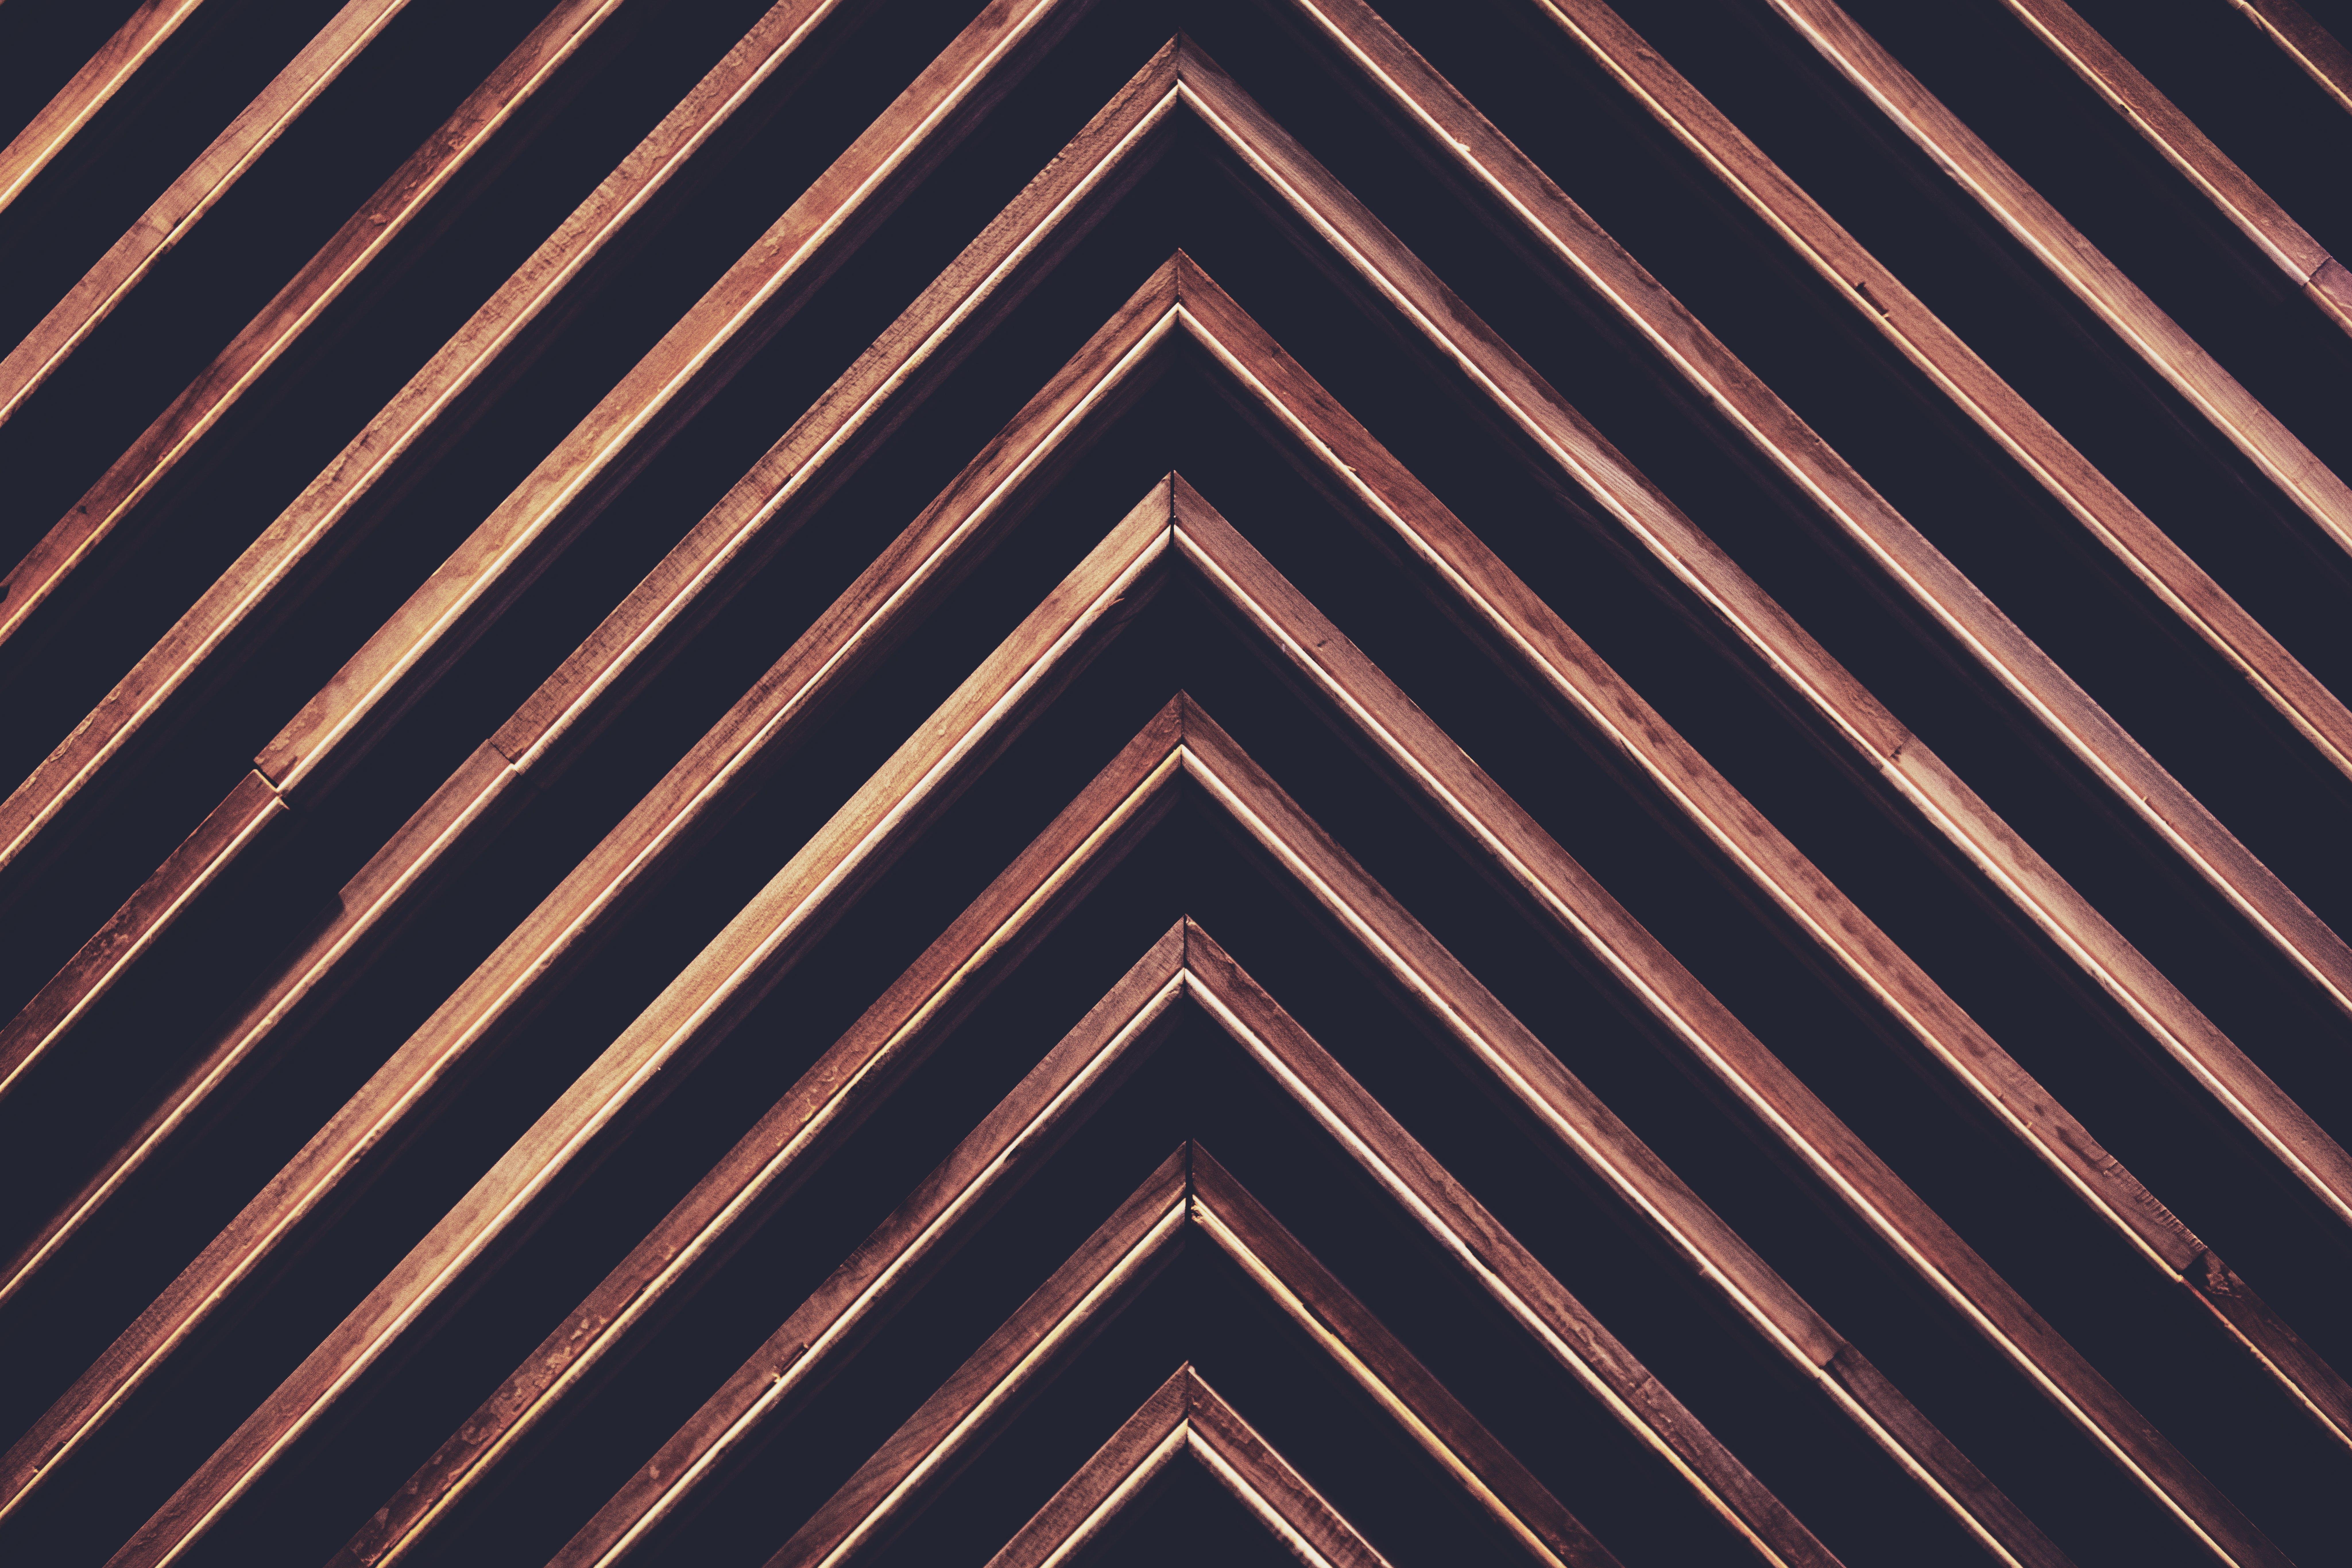 Fotos de stock gratuitas de arquitectura, contemporáneo, diagonal, diseño